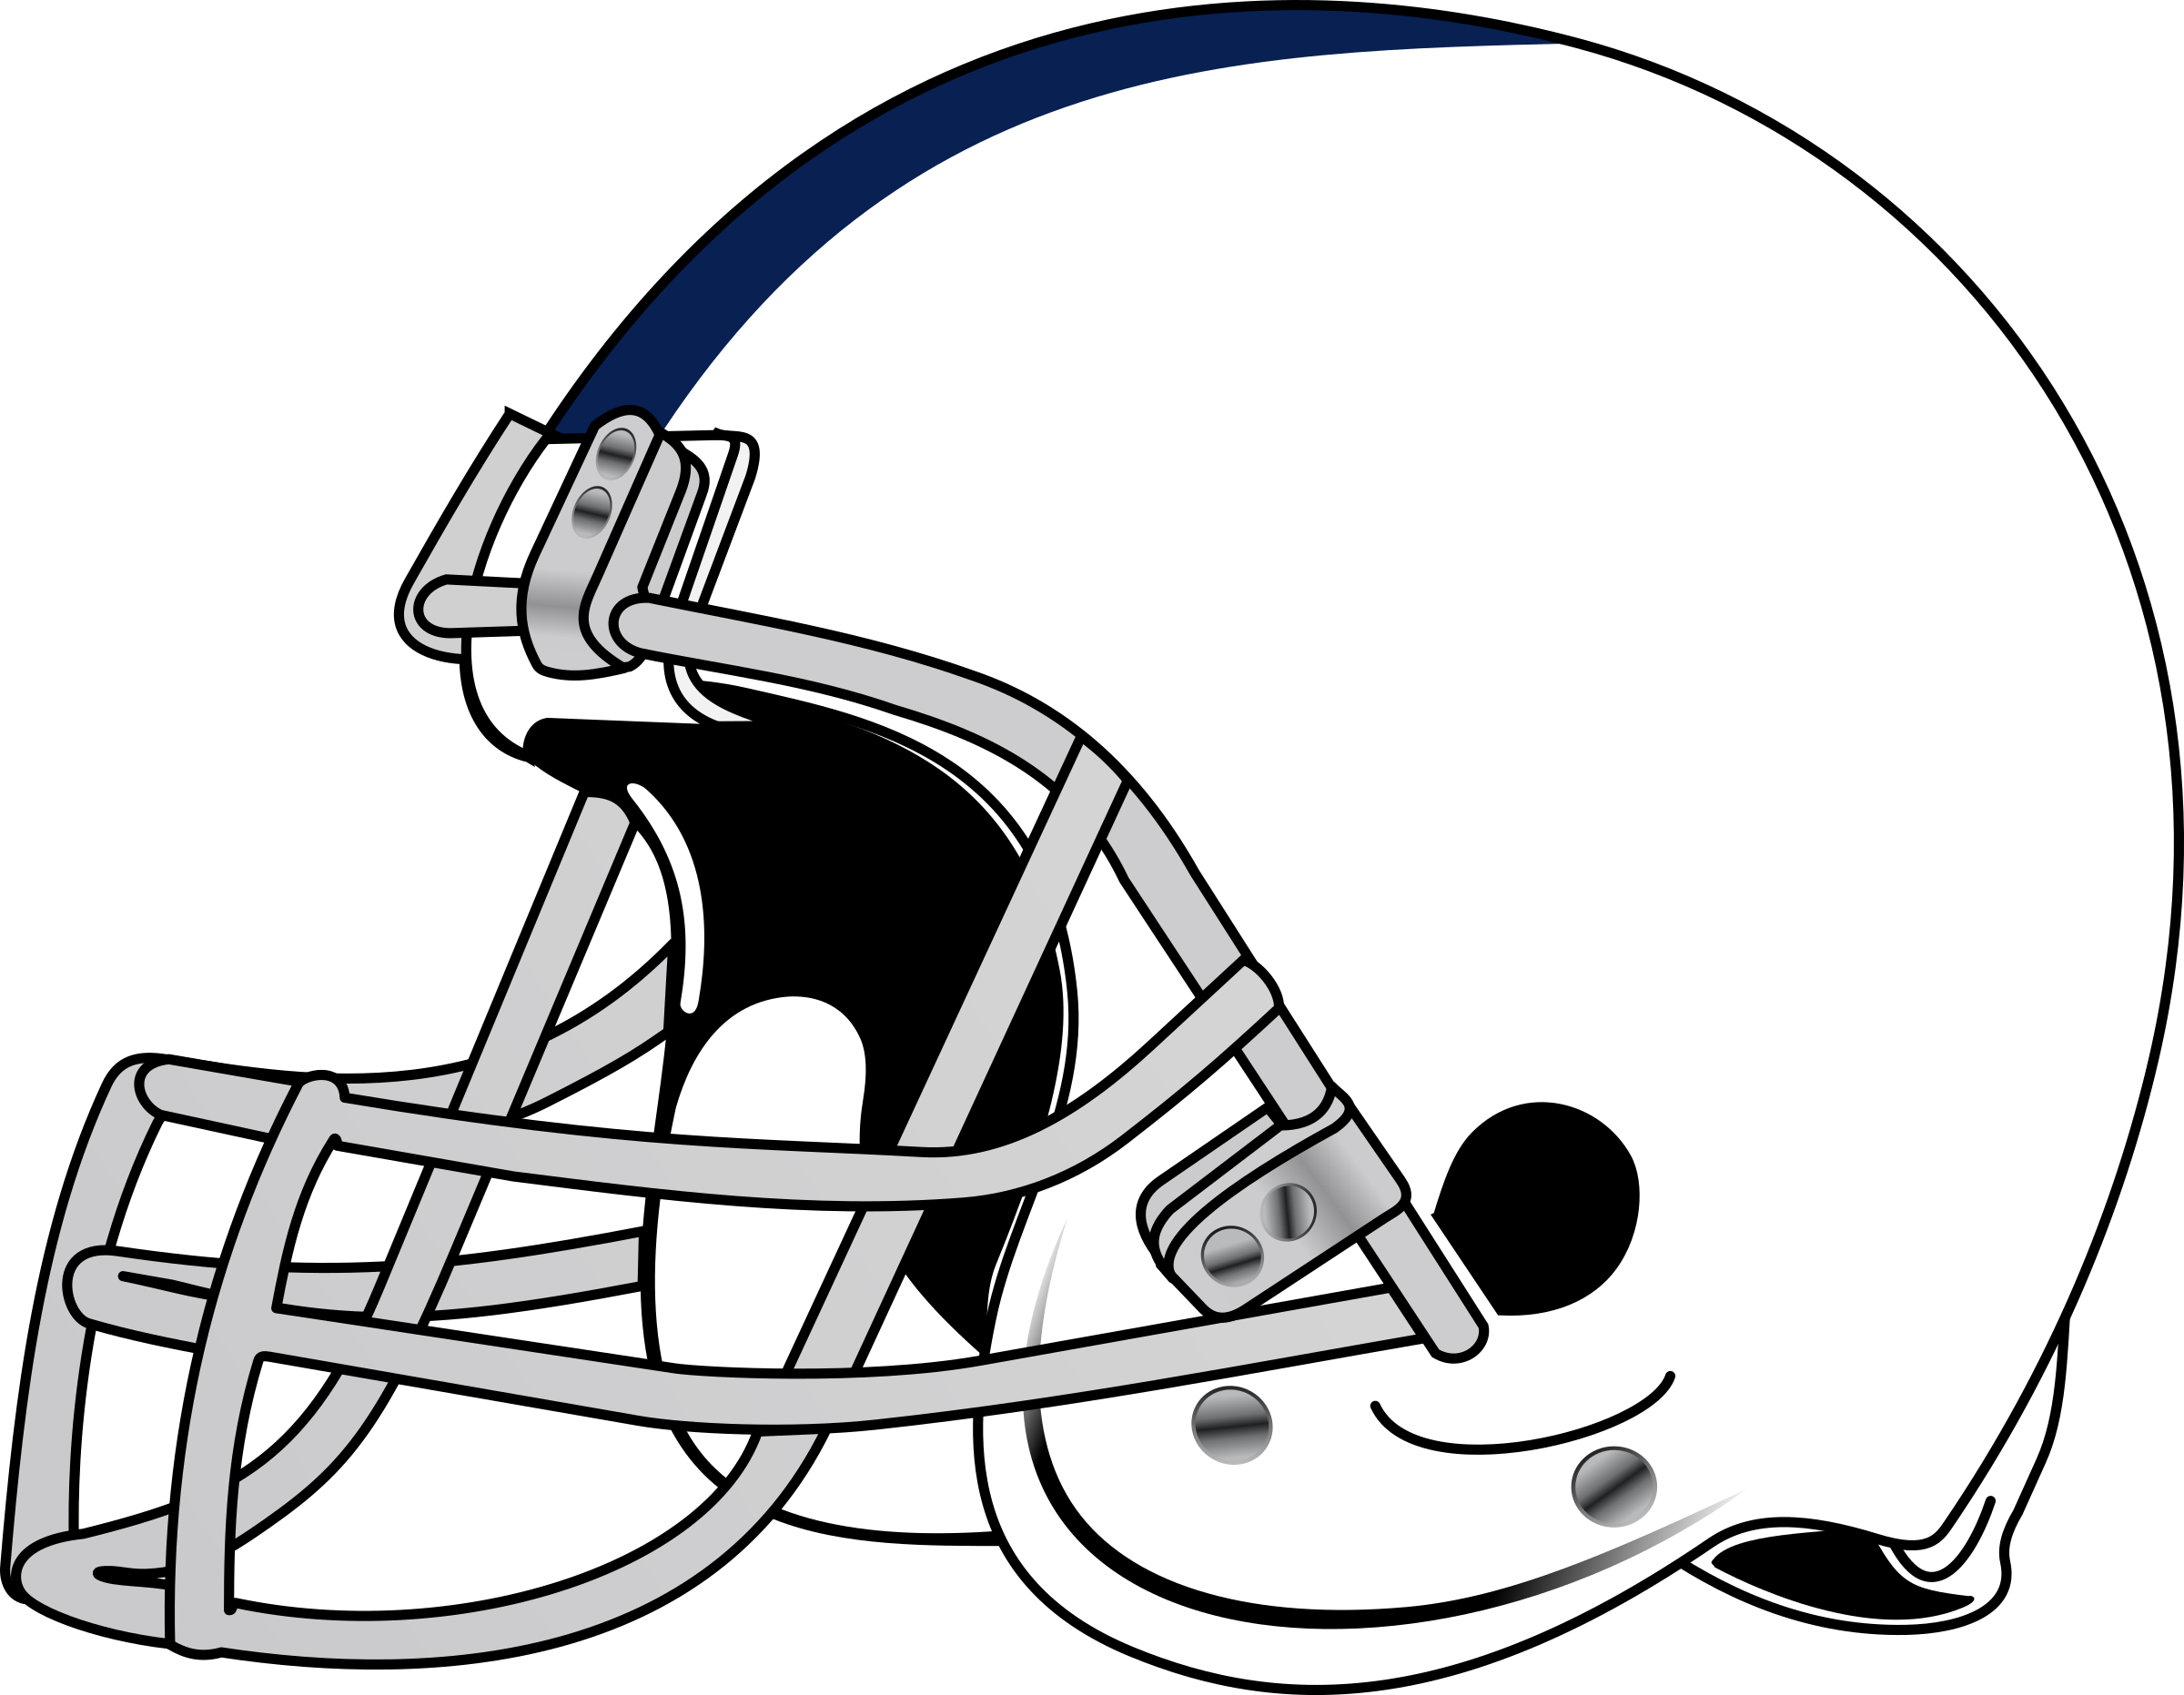 Maroon clipart football helmet Helmet Football image Clipart Pictures